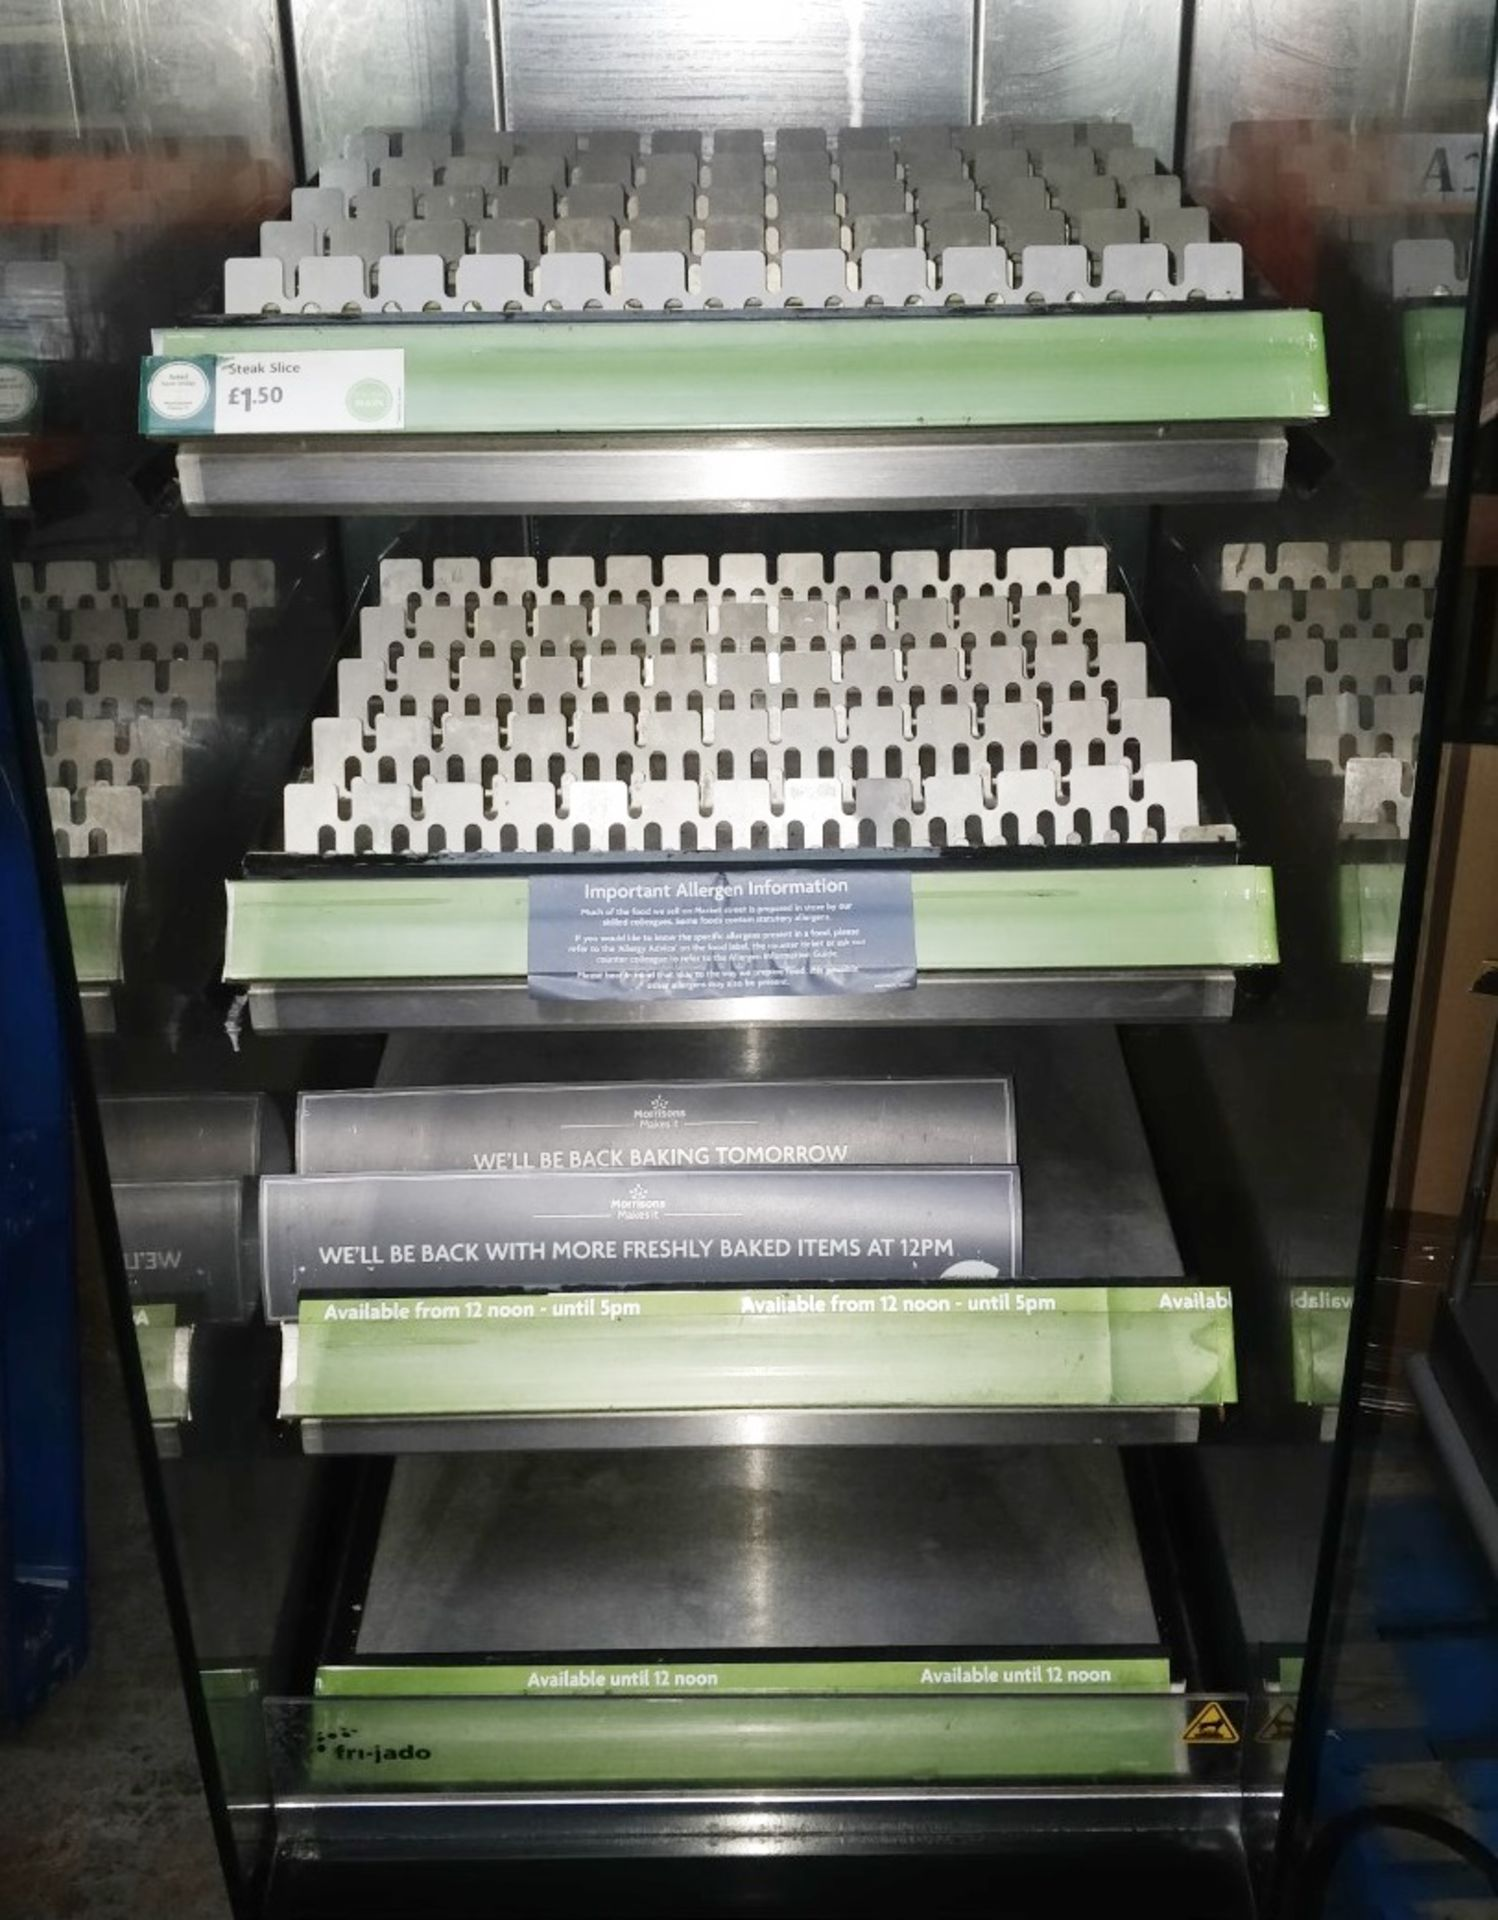 1 x Frijado Multi Deck 60 5 Level Heated Grab and Go Display Warmer - 400v 3 Phase - H197 x W60 x - Image 11 of 11